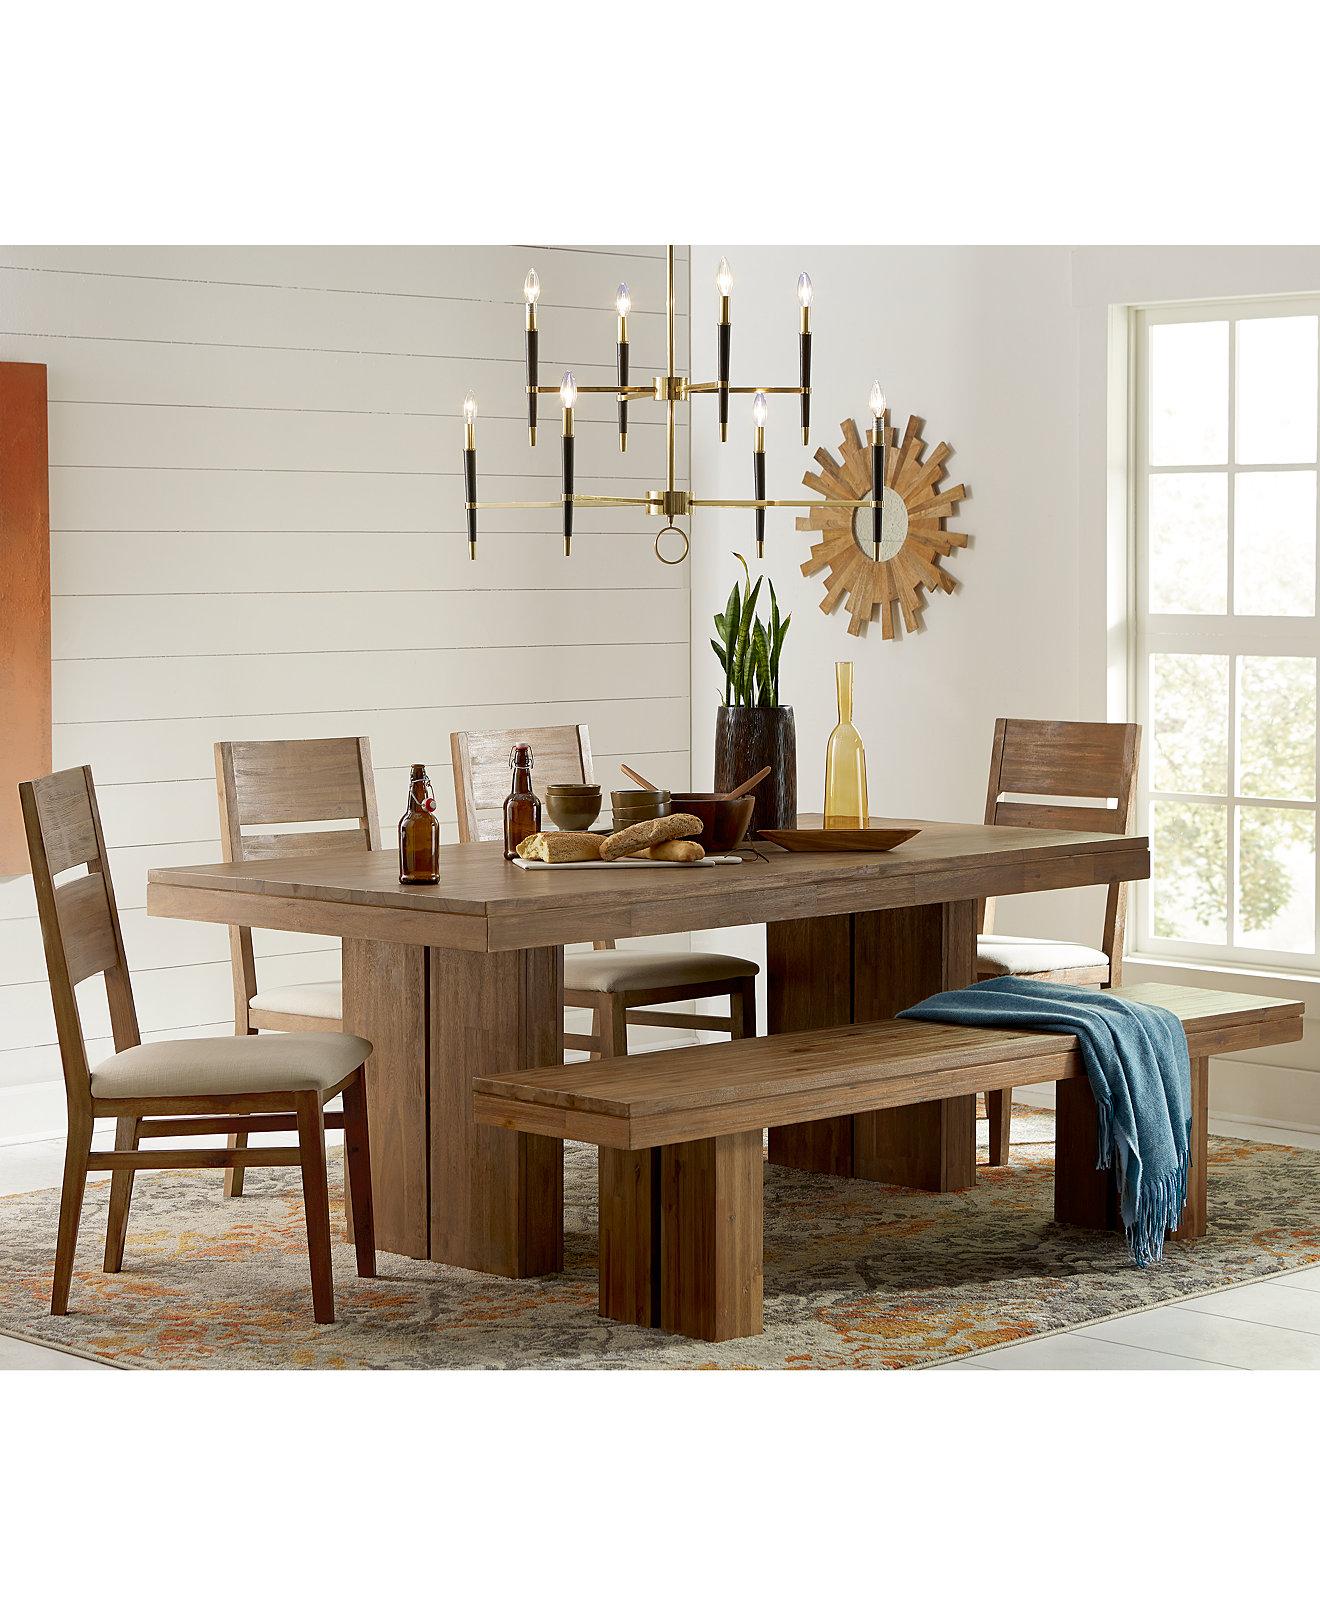 Wood Dining Room Chairs Best Price ~ Congresos-Pontevedra.com